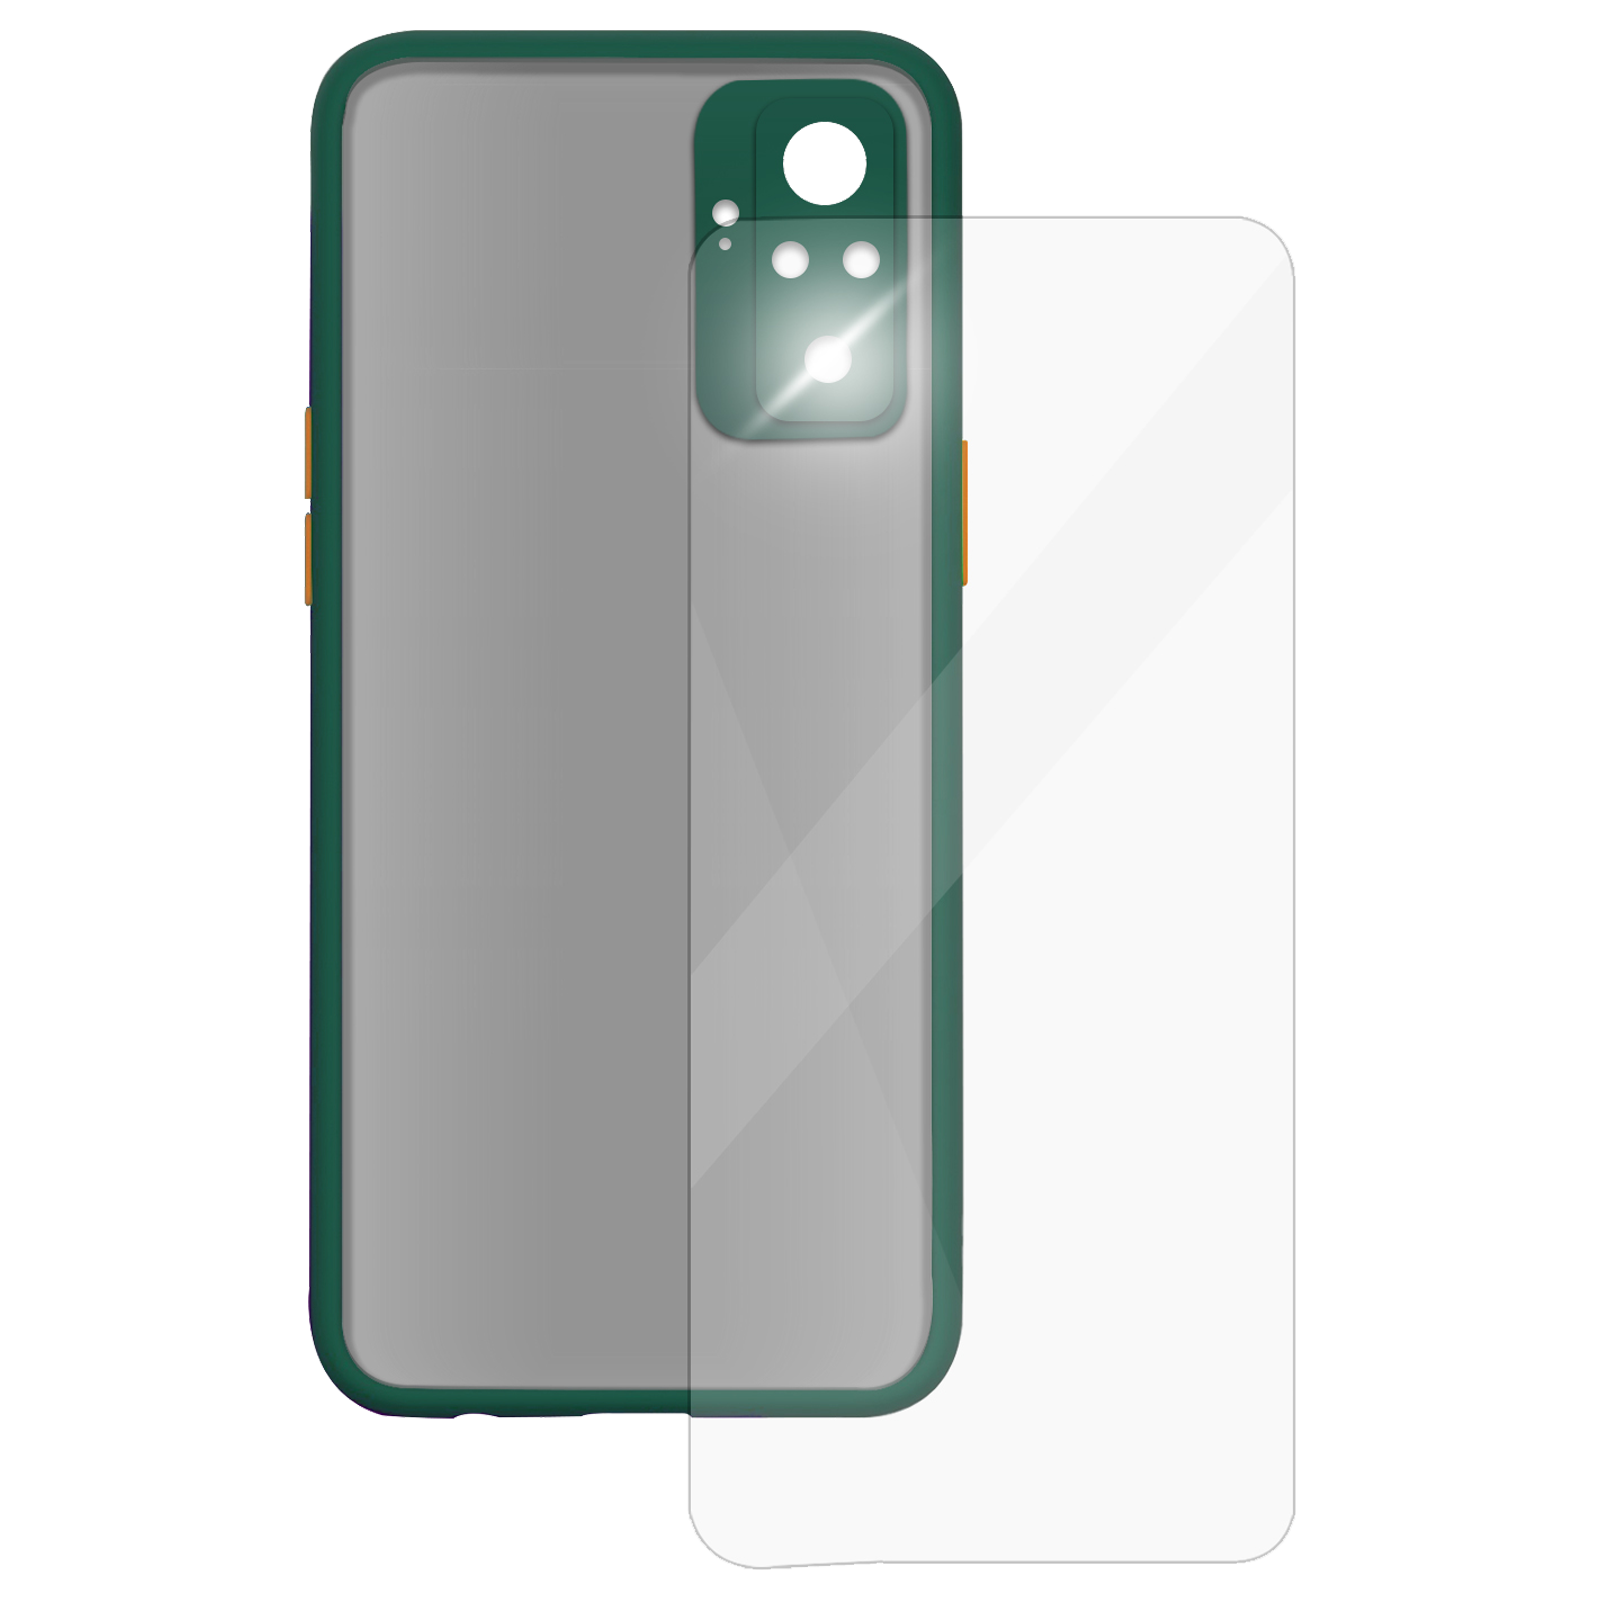 Arrow Camera Duplex Back Case and Screen Protector Bundle For Xiaomi Redmi Note 10 Pro (Ultra Transparent Visibility, AR-1011, Dark Green)_1